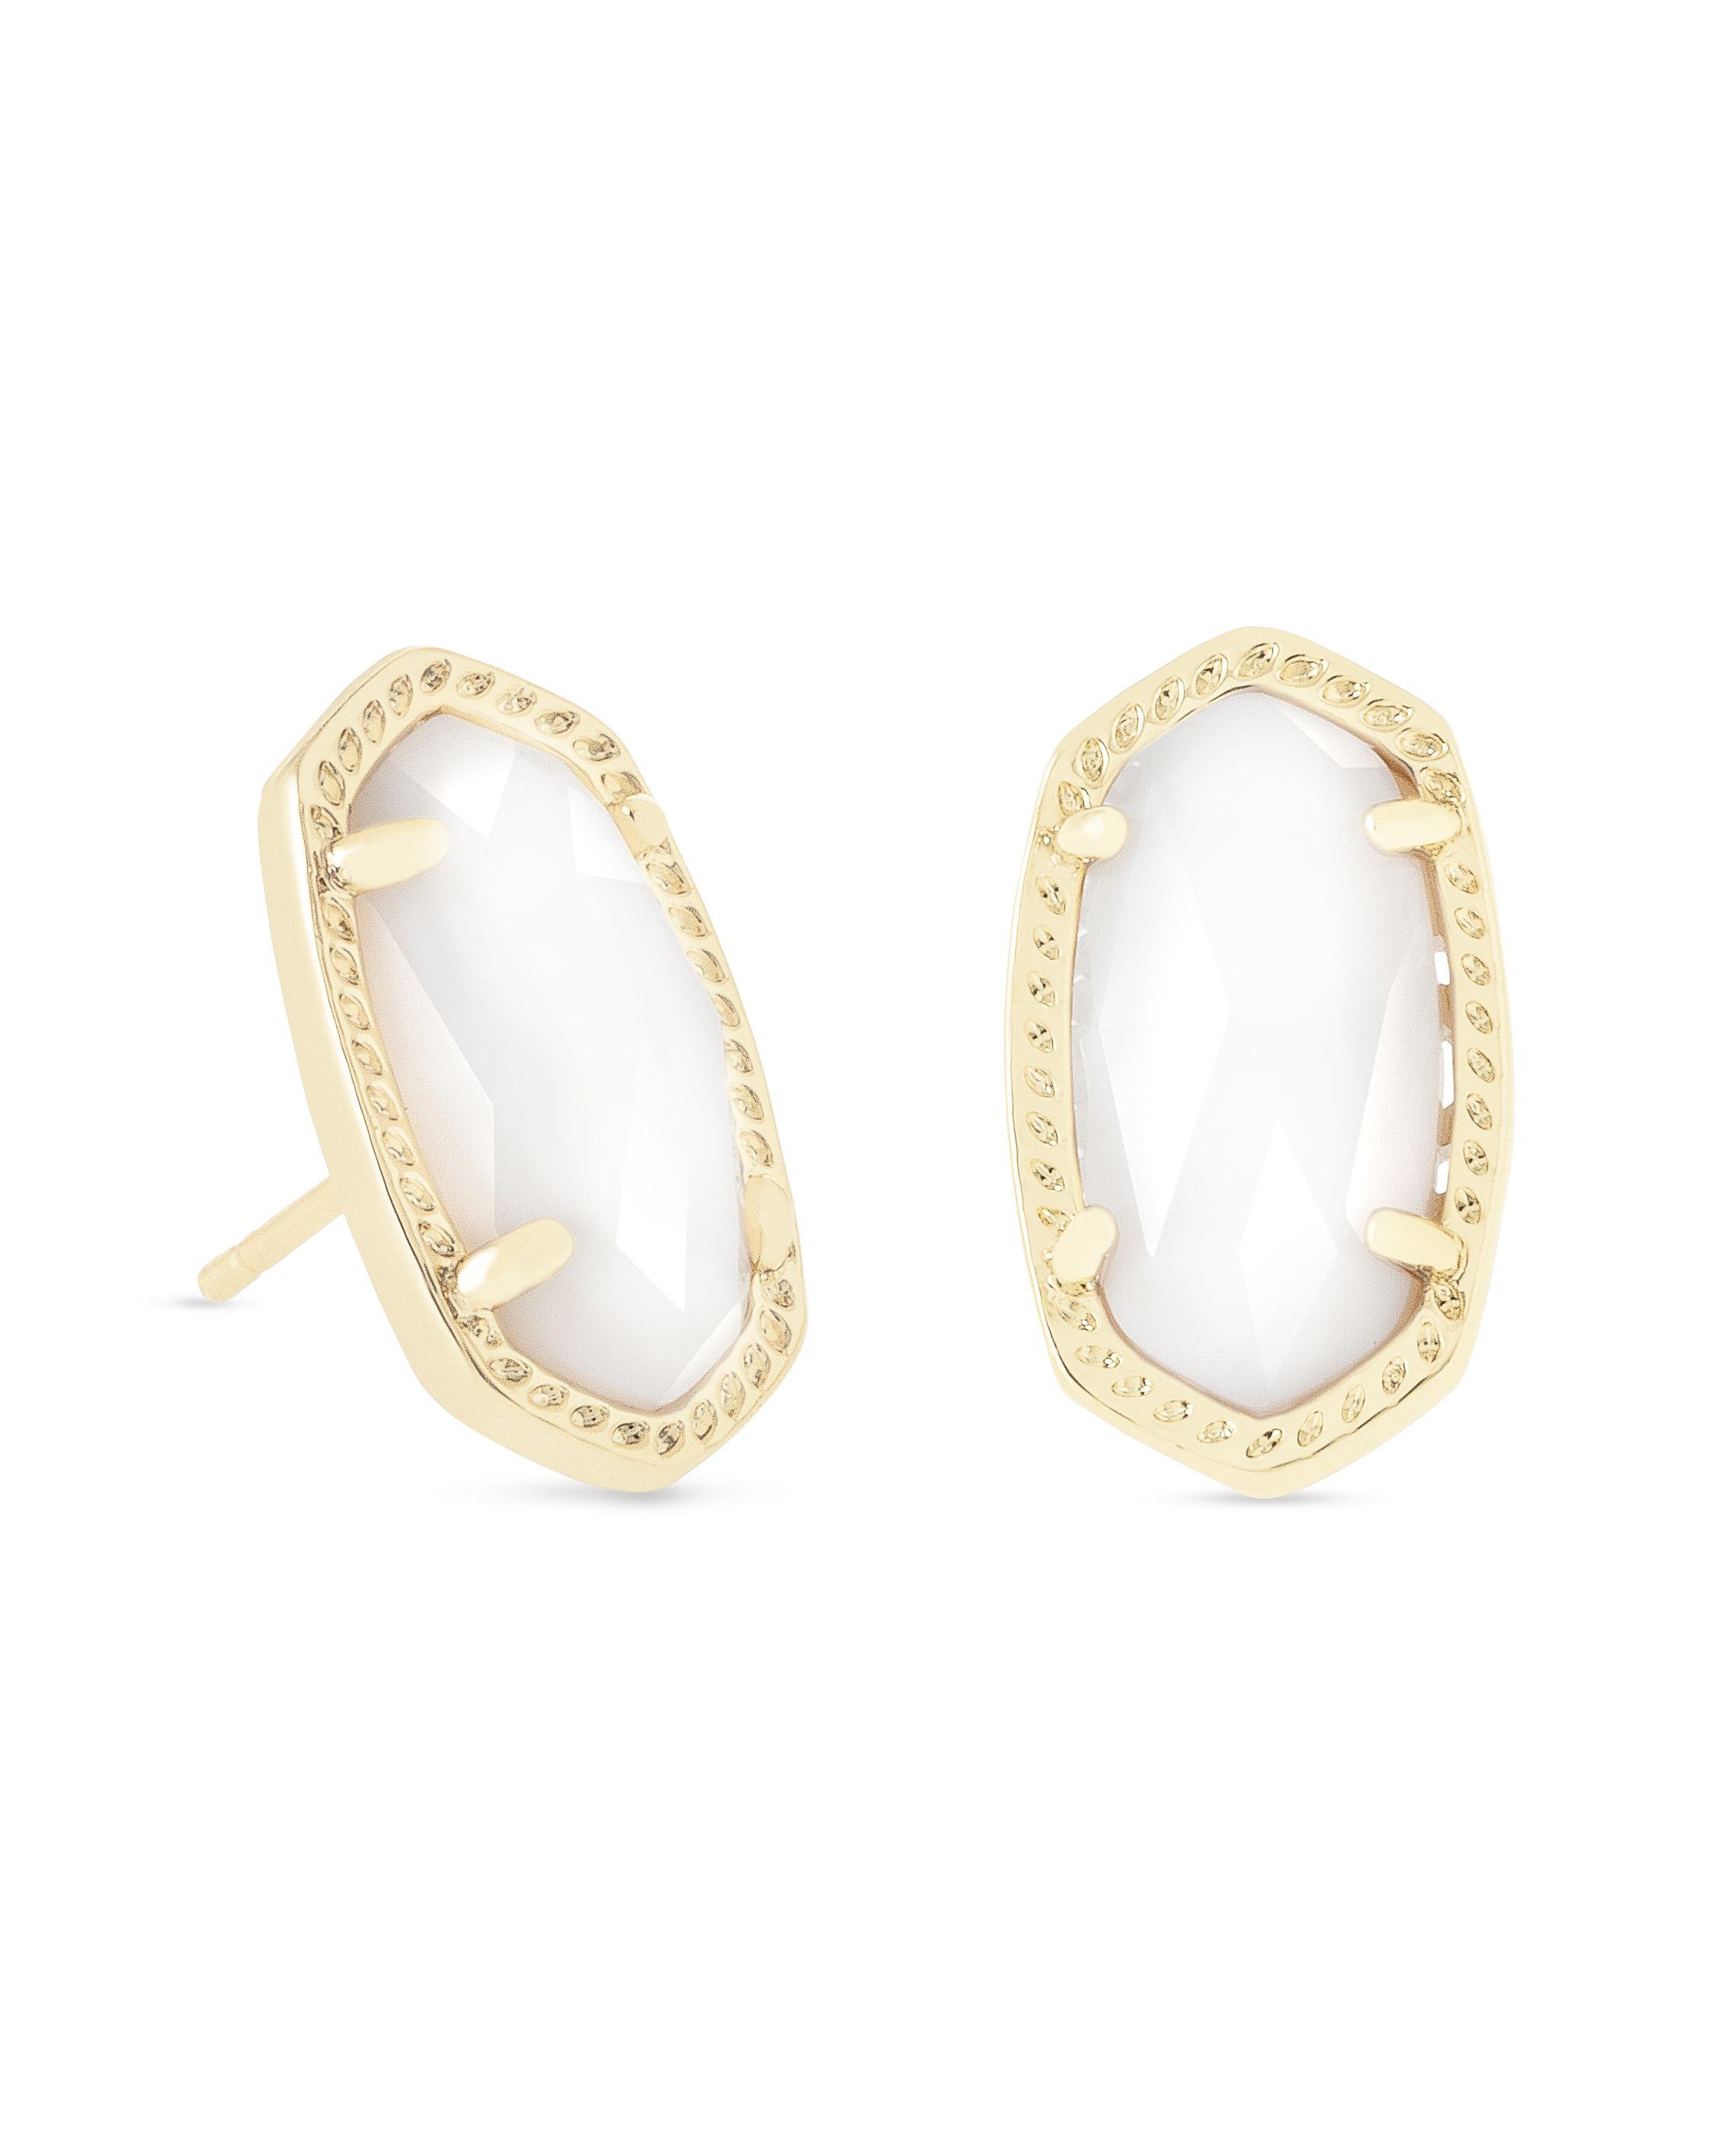 ca51c61ca Ellie Gold Stud Earrings in White Pearl - Kendra Scott Jewelry ...